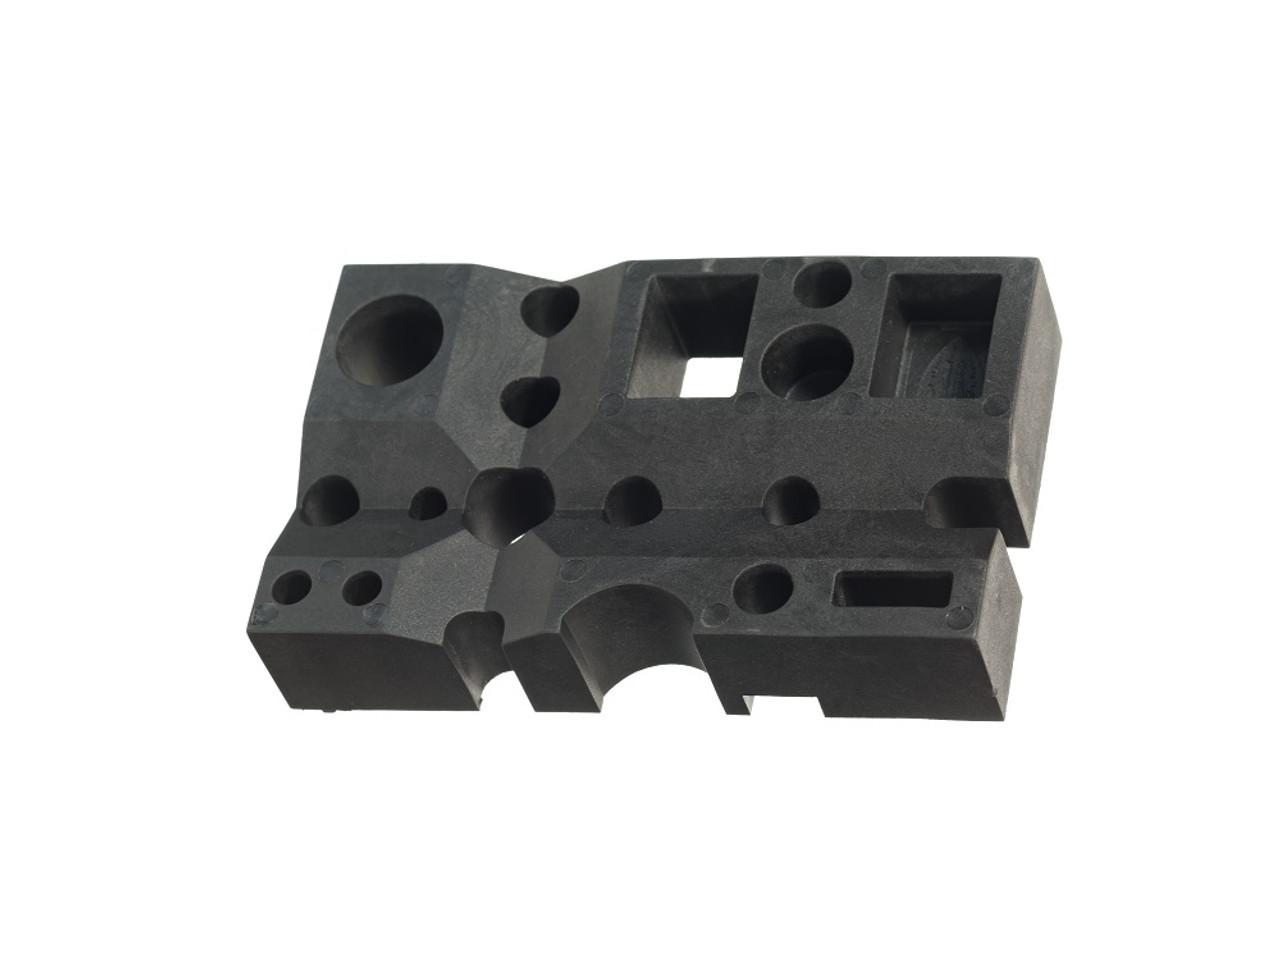 Archangel Gunsmith Bench Block Black Polymer Promag Industries